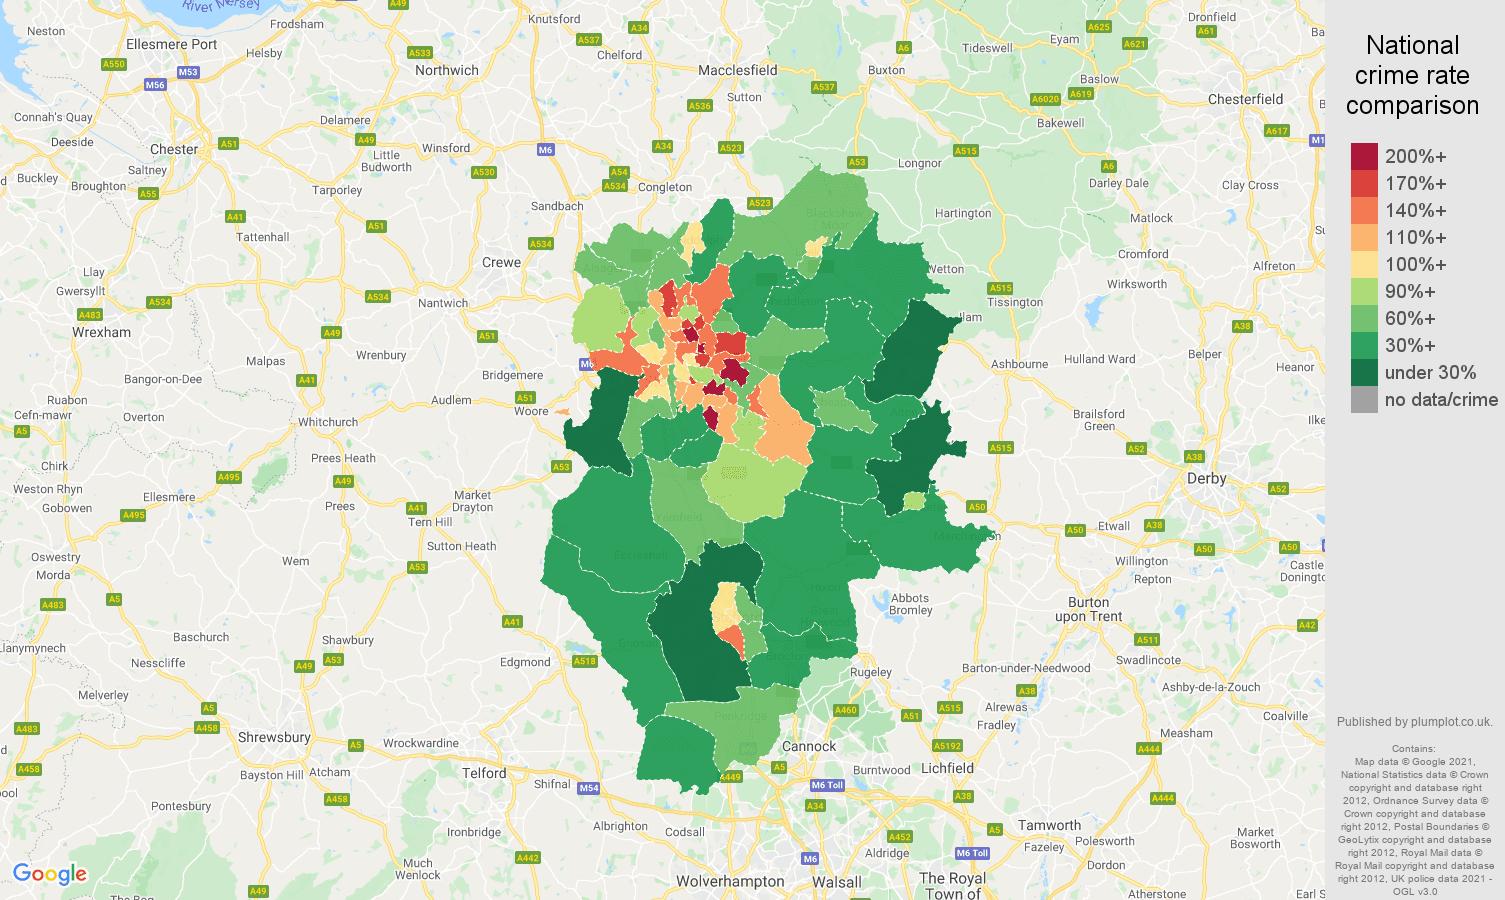 Stoke on Trent antisocial behaviour crime rate comparison map